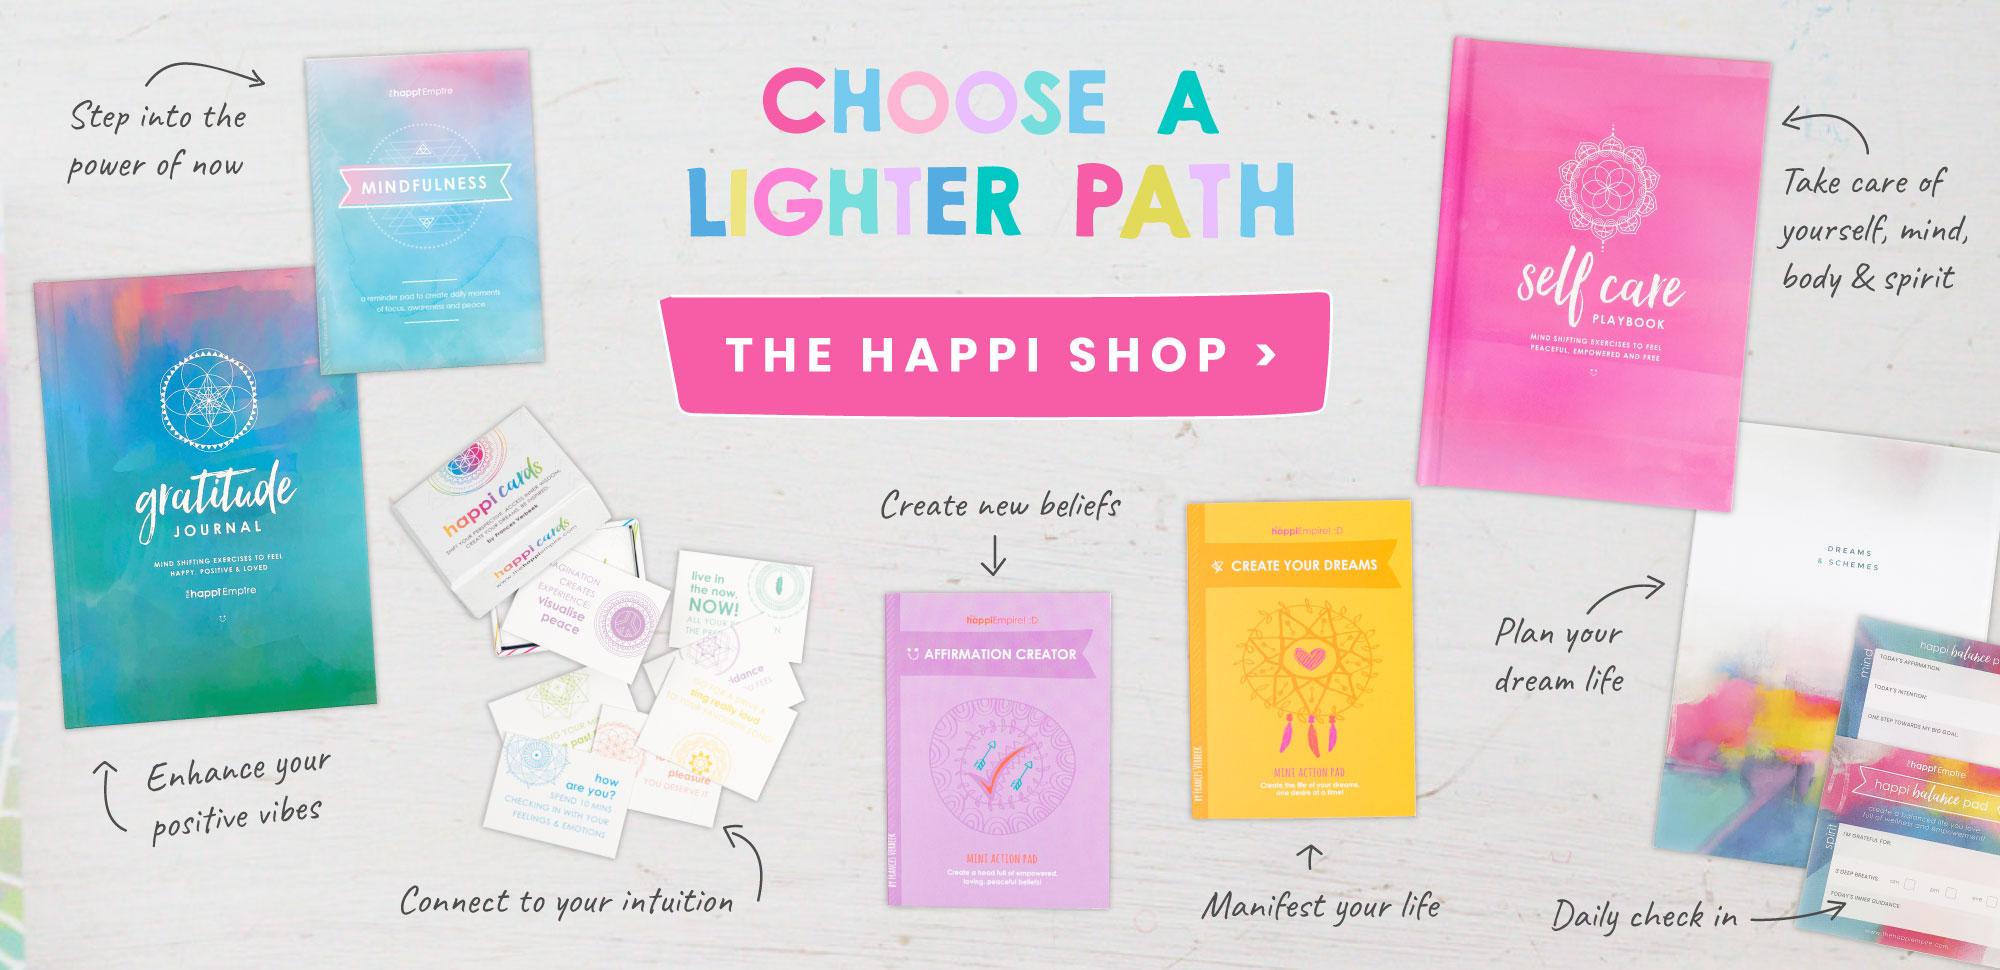 Choose a lighter path